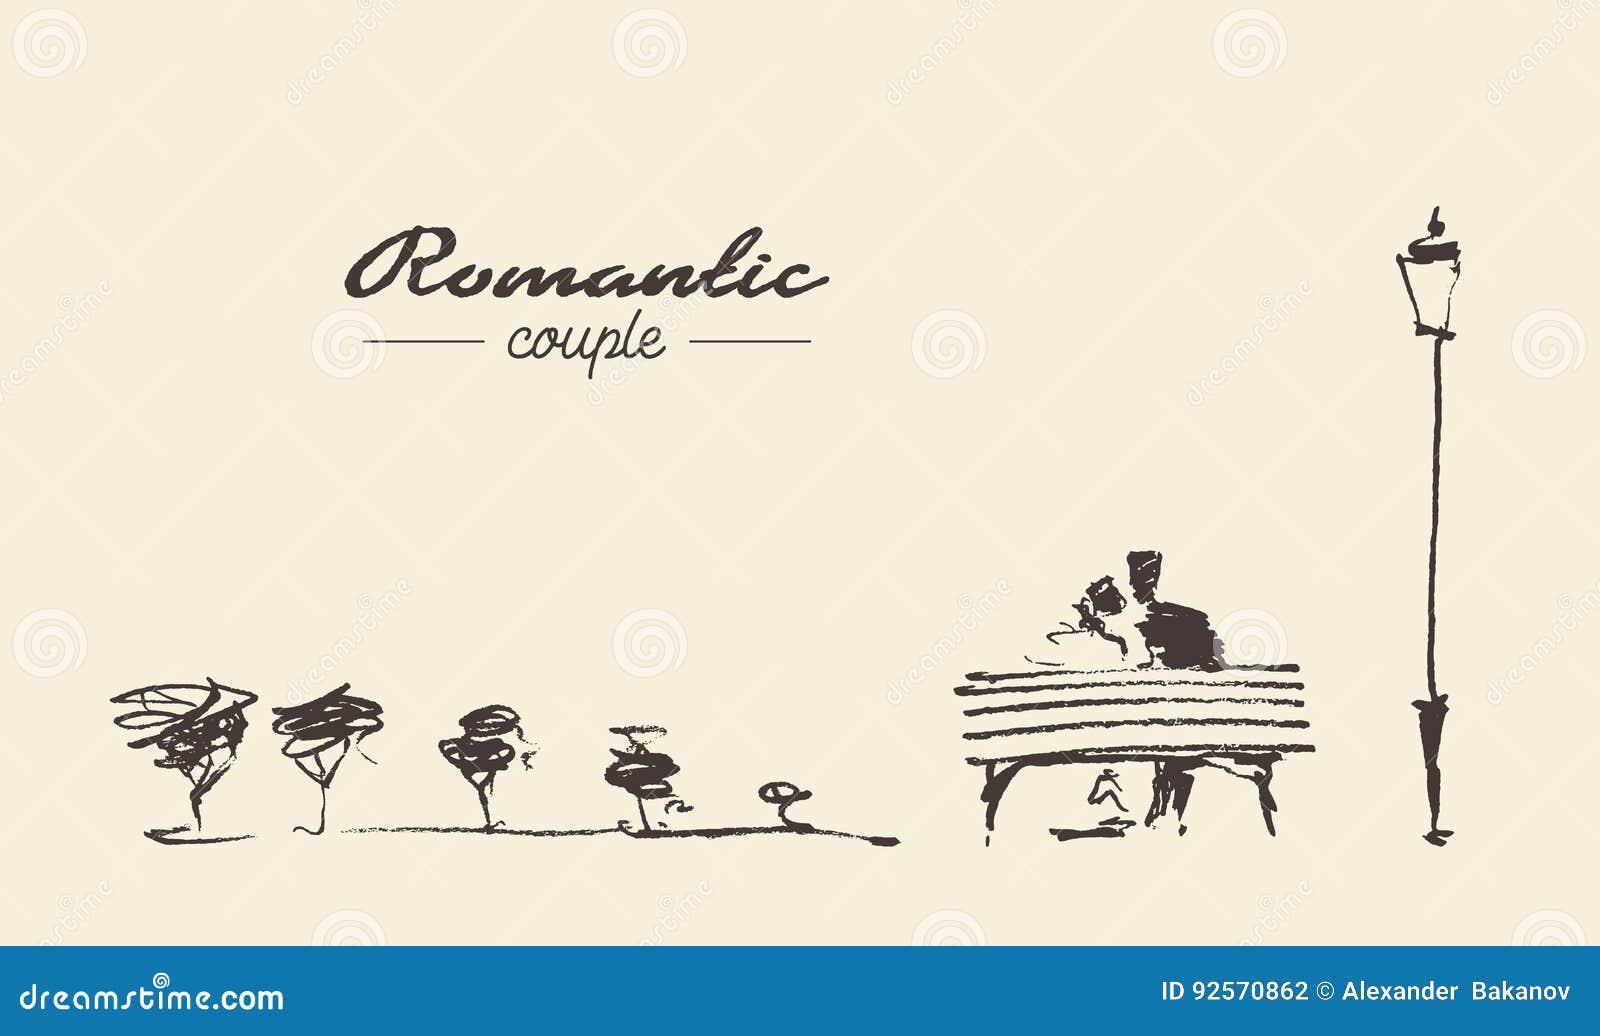 Romantic sketch loving couple bench drawn sketch